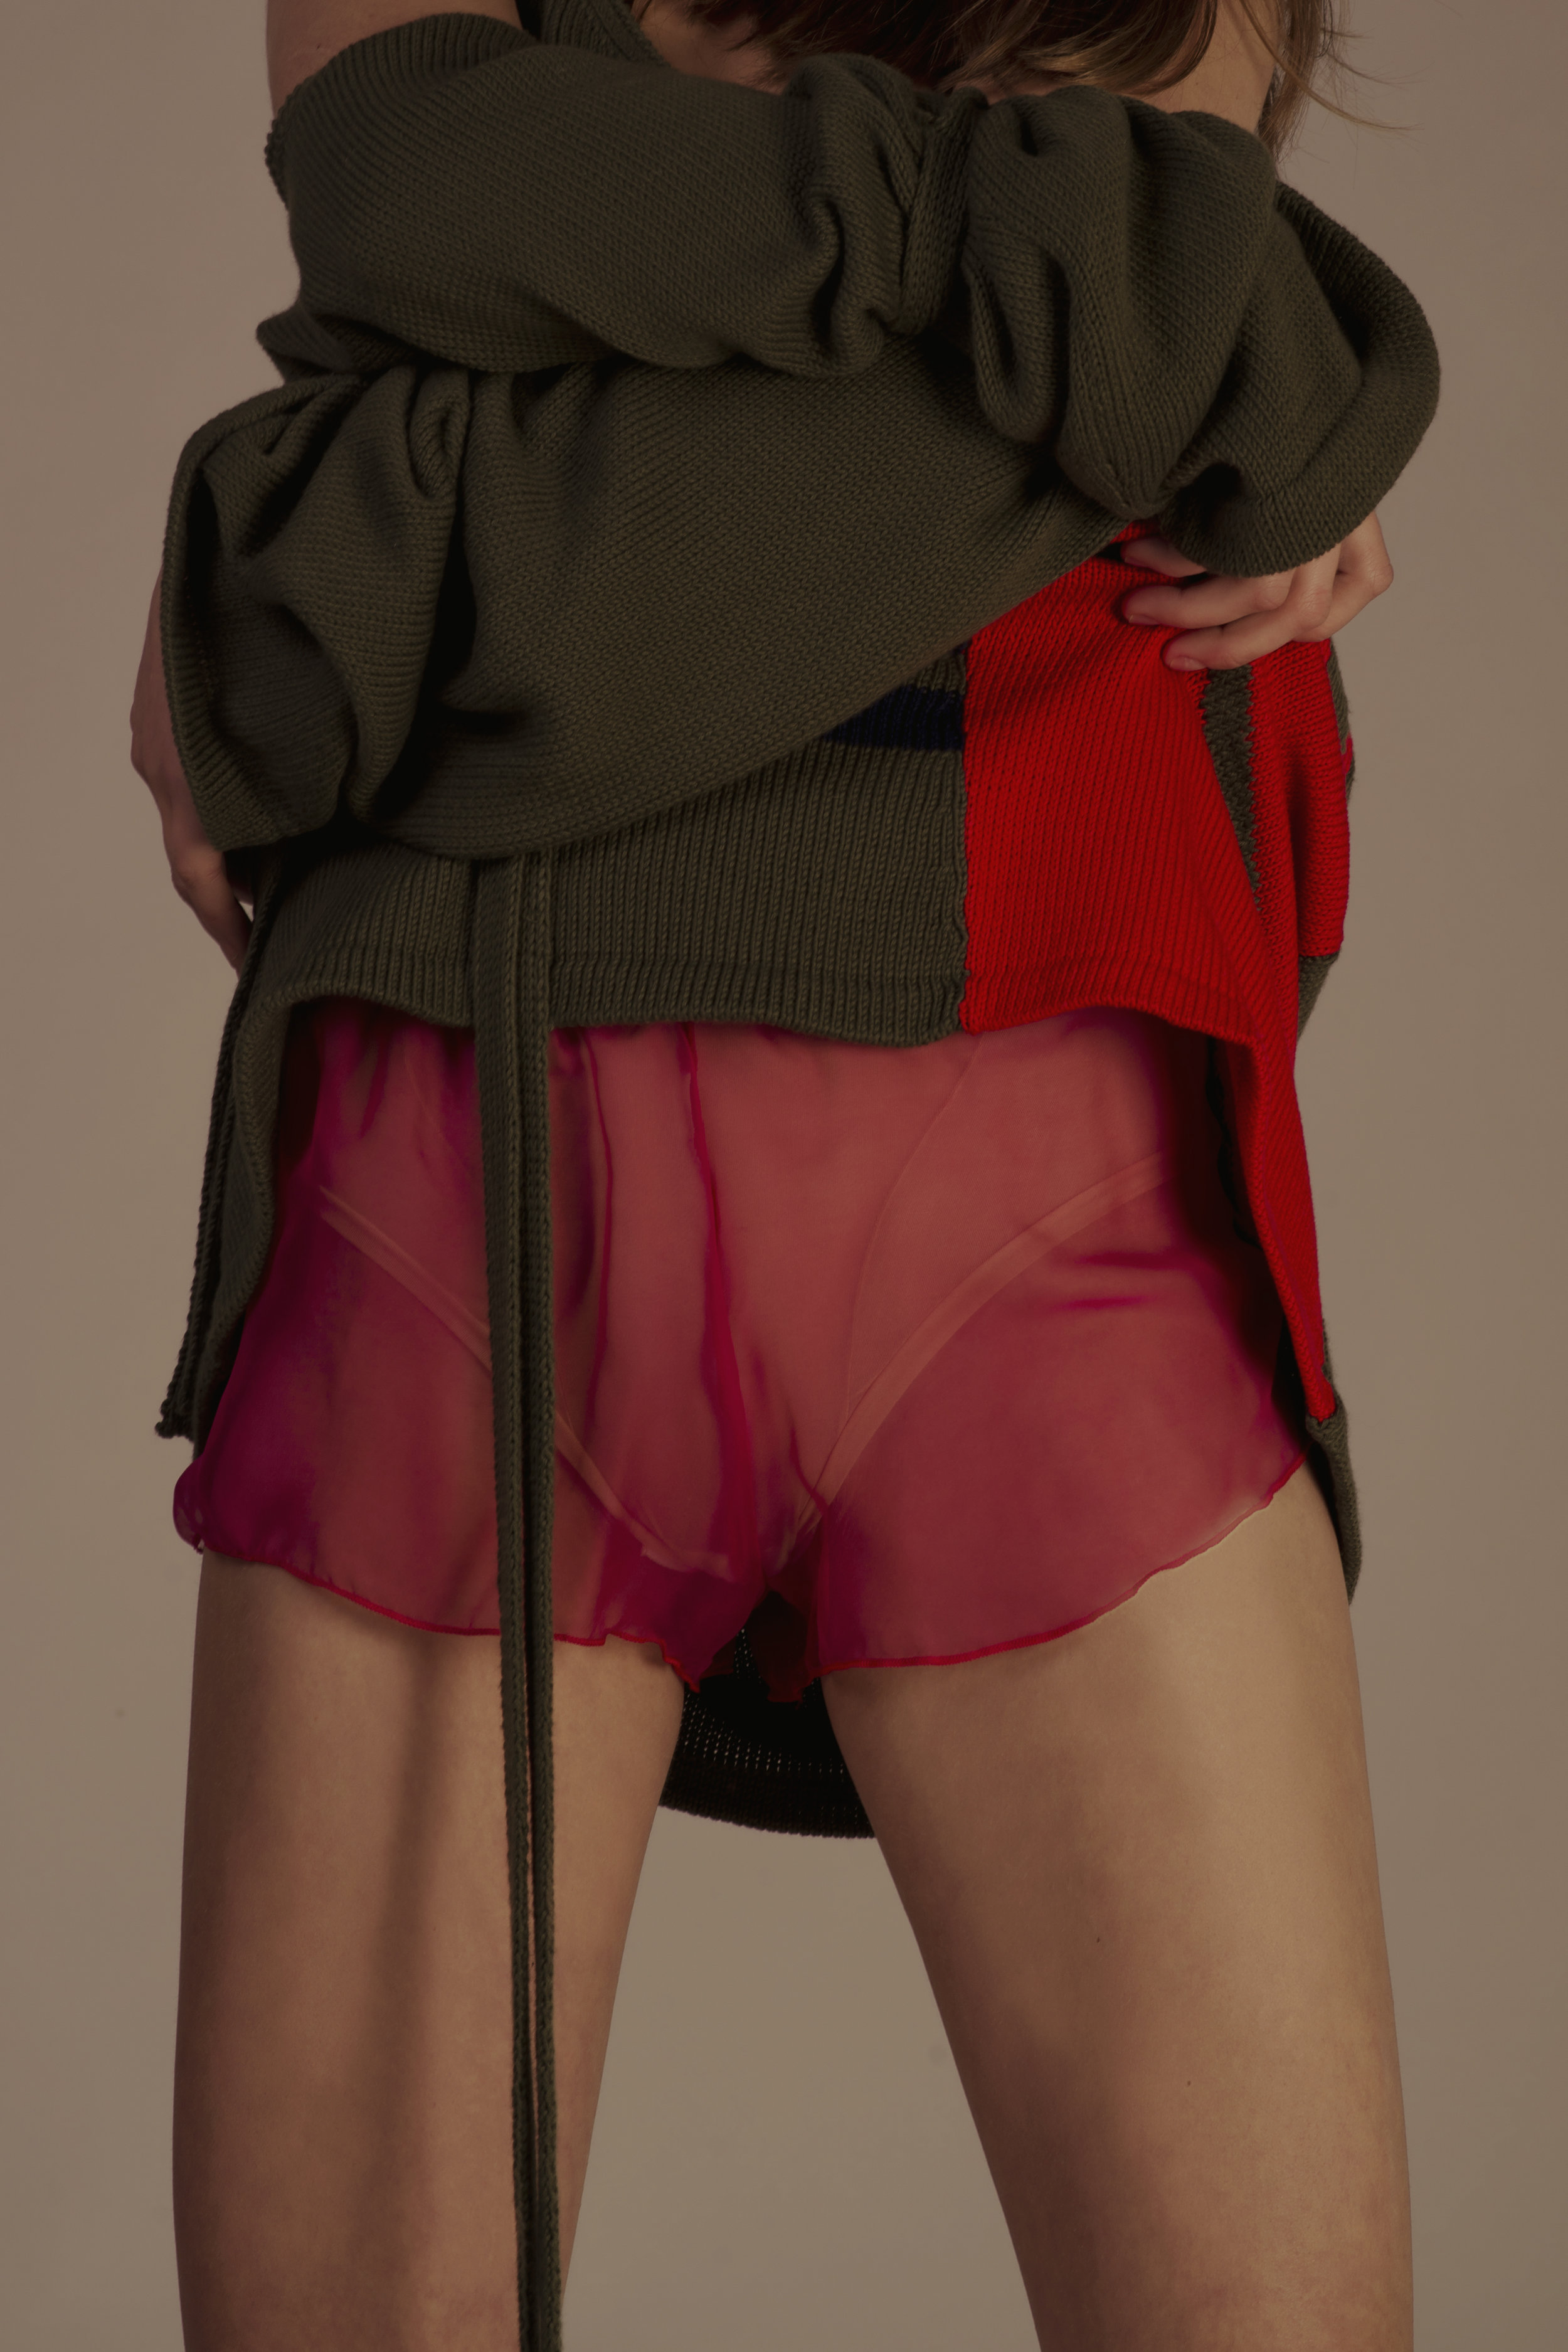 dress GIUSEPPE D'ANDREA, panties INDIVIDUALS